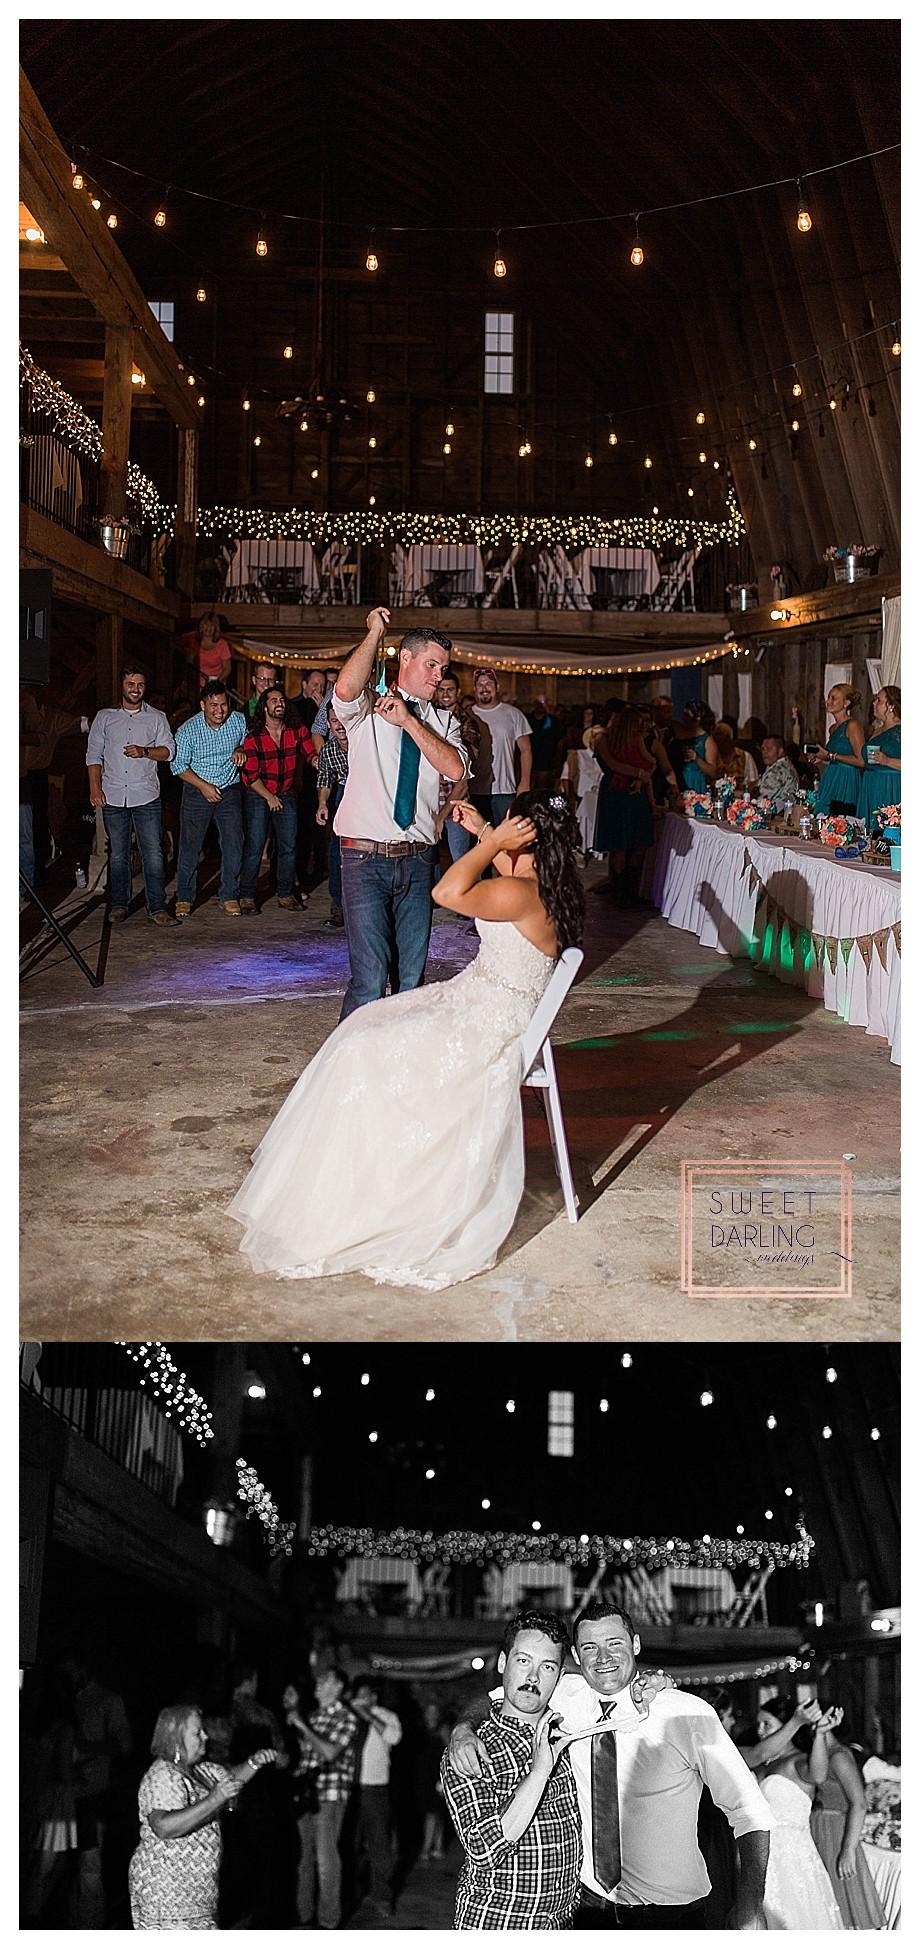 wedding-barn-farm-horses-sparkler-exit-Engelbrecht-Farm-Paxton-Illinois-Sweet-Darling-Weddings-Photographer_0500